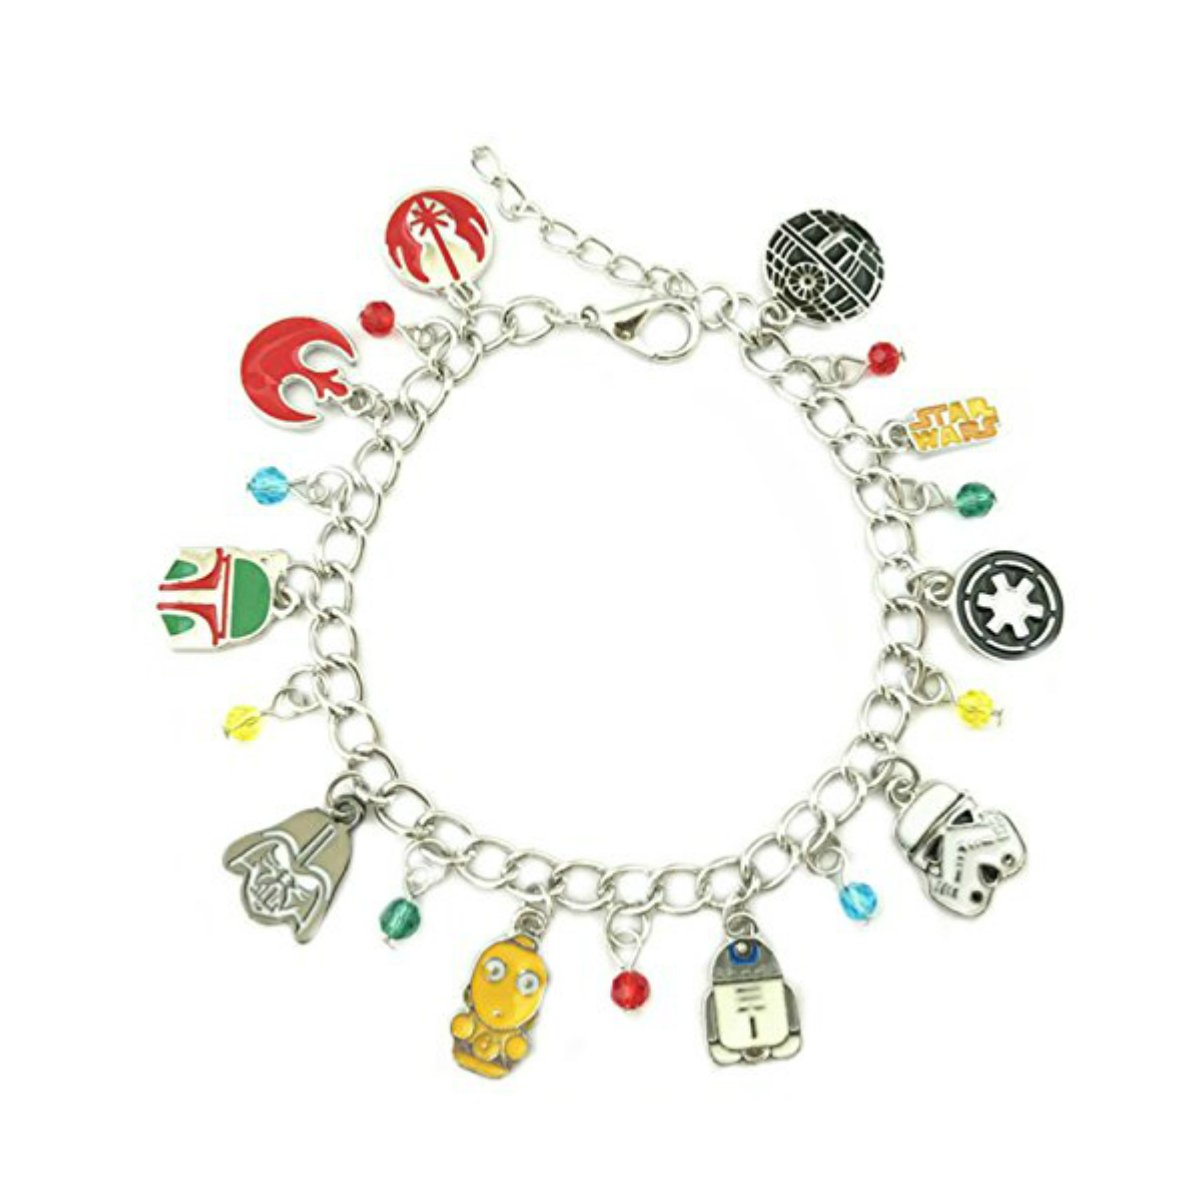 US FAMILY Star Wars Enamel Movie Theme Multi Charms Jewelry Bracelets Charm by Family Brands